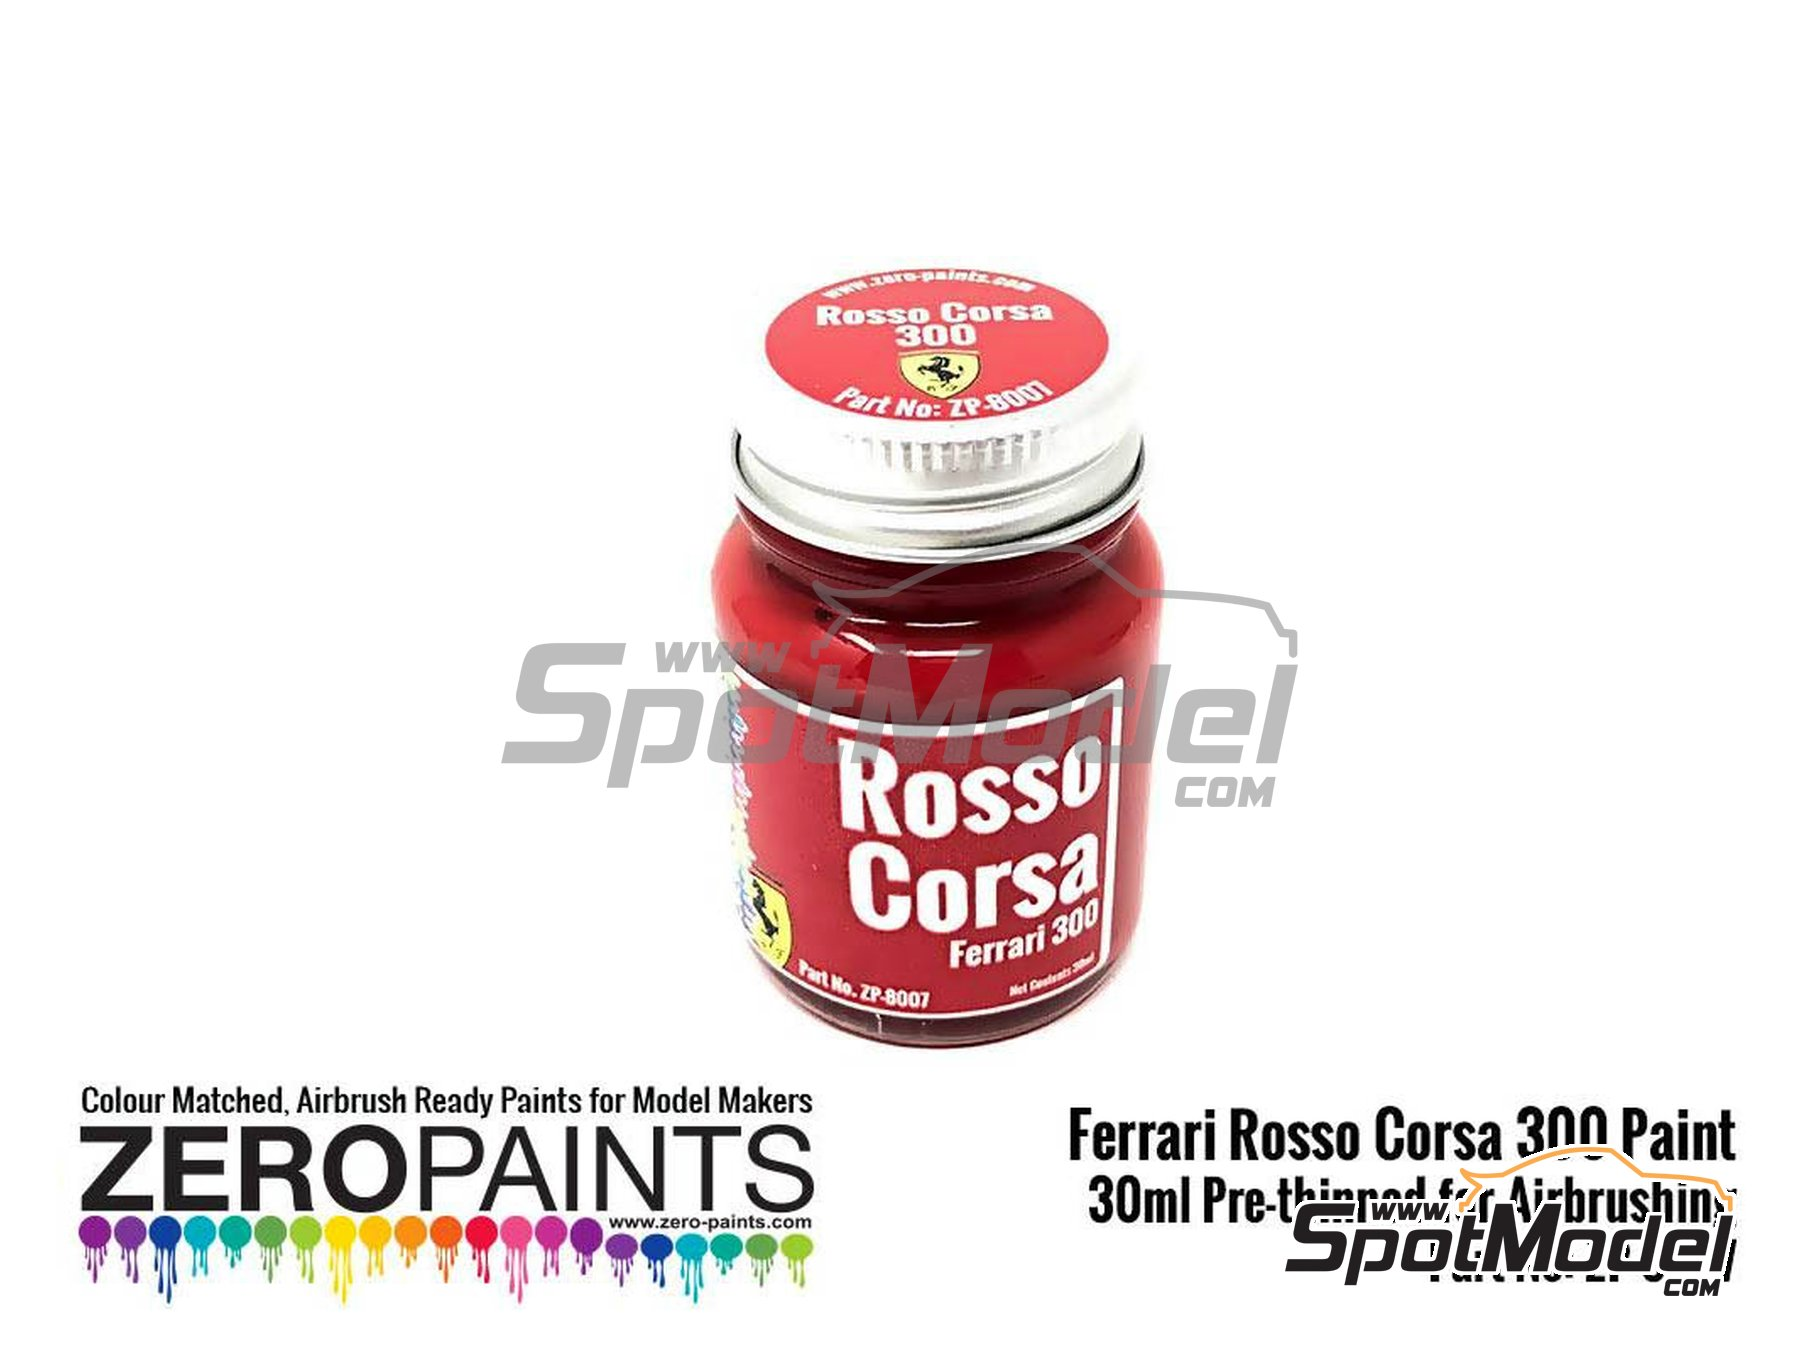 Image 1: Ferrari Rosso Corsa 300 - 1 x 30ml | Paint manufactured by Zero Paints (ref.ZP-8007-300)